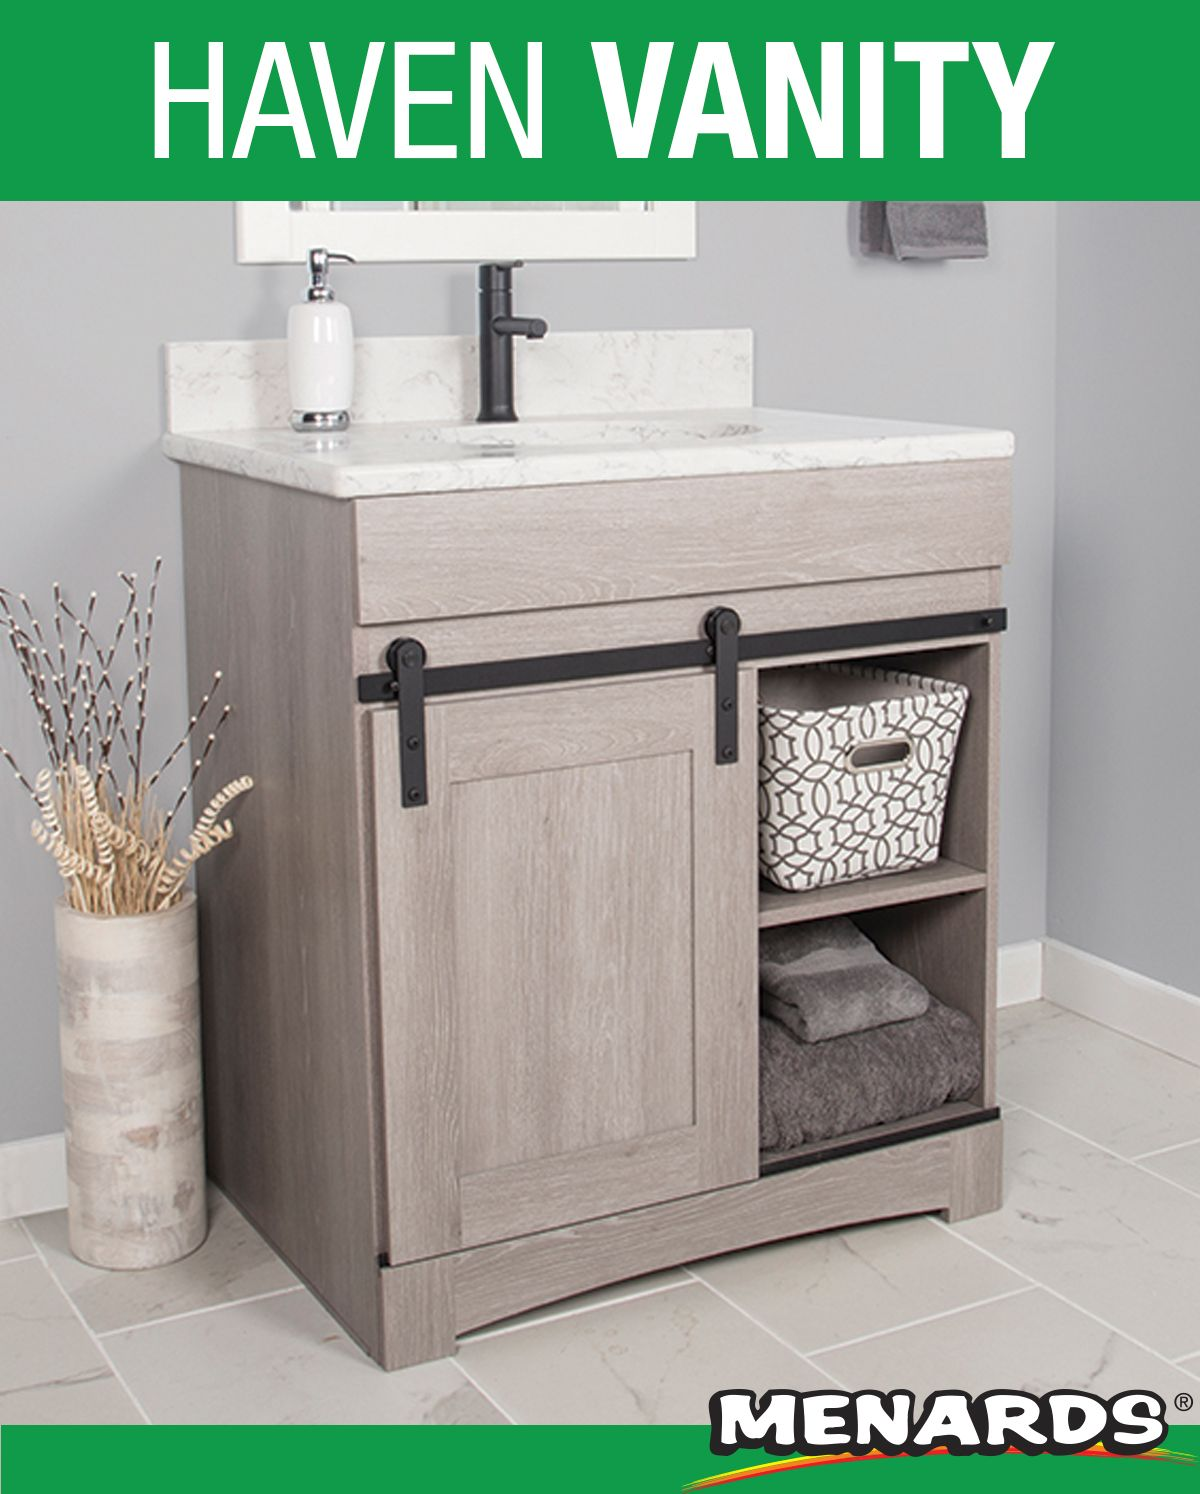 The Dakota Sliding Barn Door Vanity Creates Elegant And Functional Furnishings That Make Your Home Vanity Sliding Barn Door Bathroom Bathroom Vanity Cabinets [ 1494 x 1200 Pixel ]